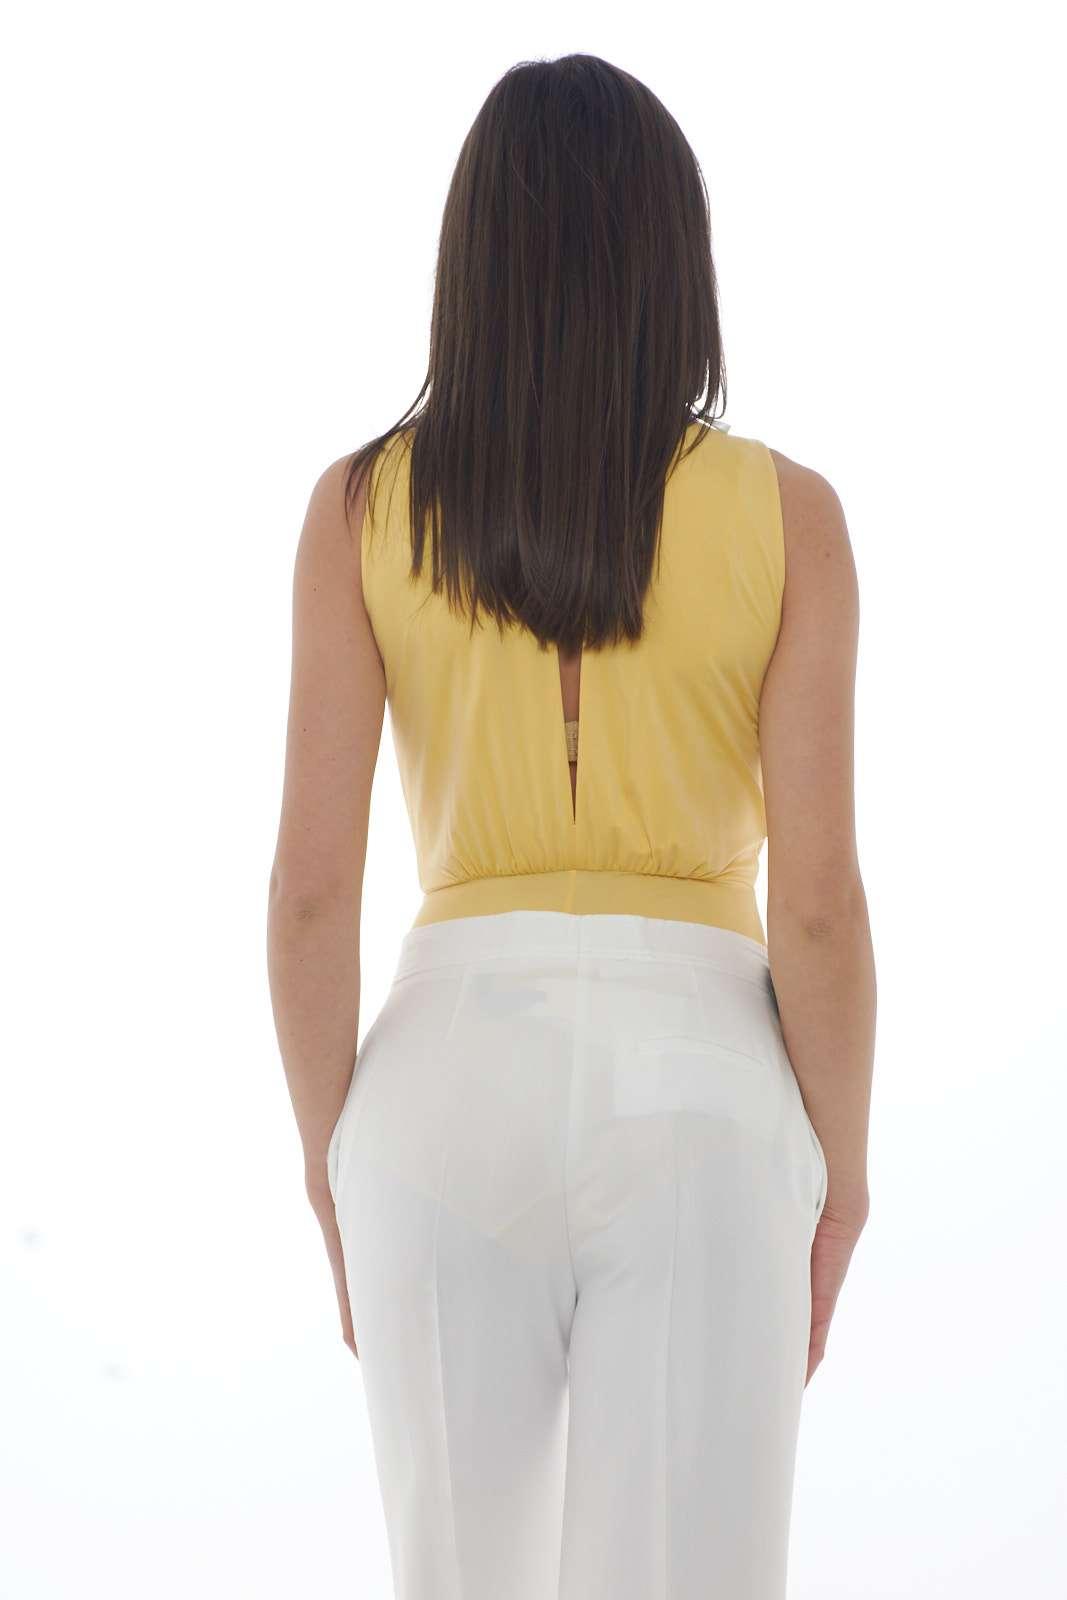 https://www.parmax.com/media/catalog/product/a/i/PE-outlet_parmax-body-donna-Elisabetta-Franchi-bo16692e2-C_1.jpg